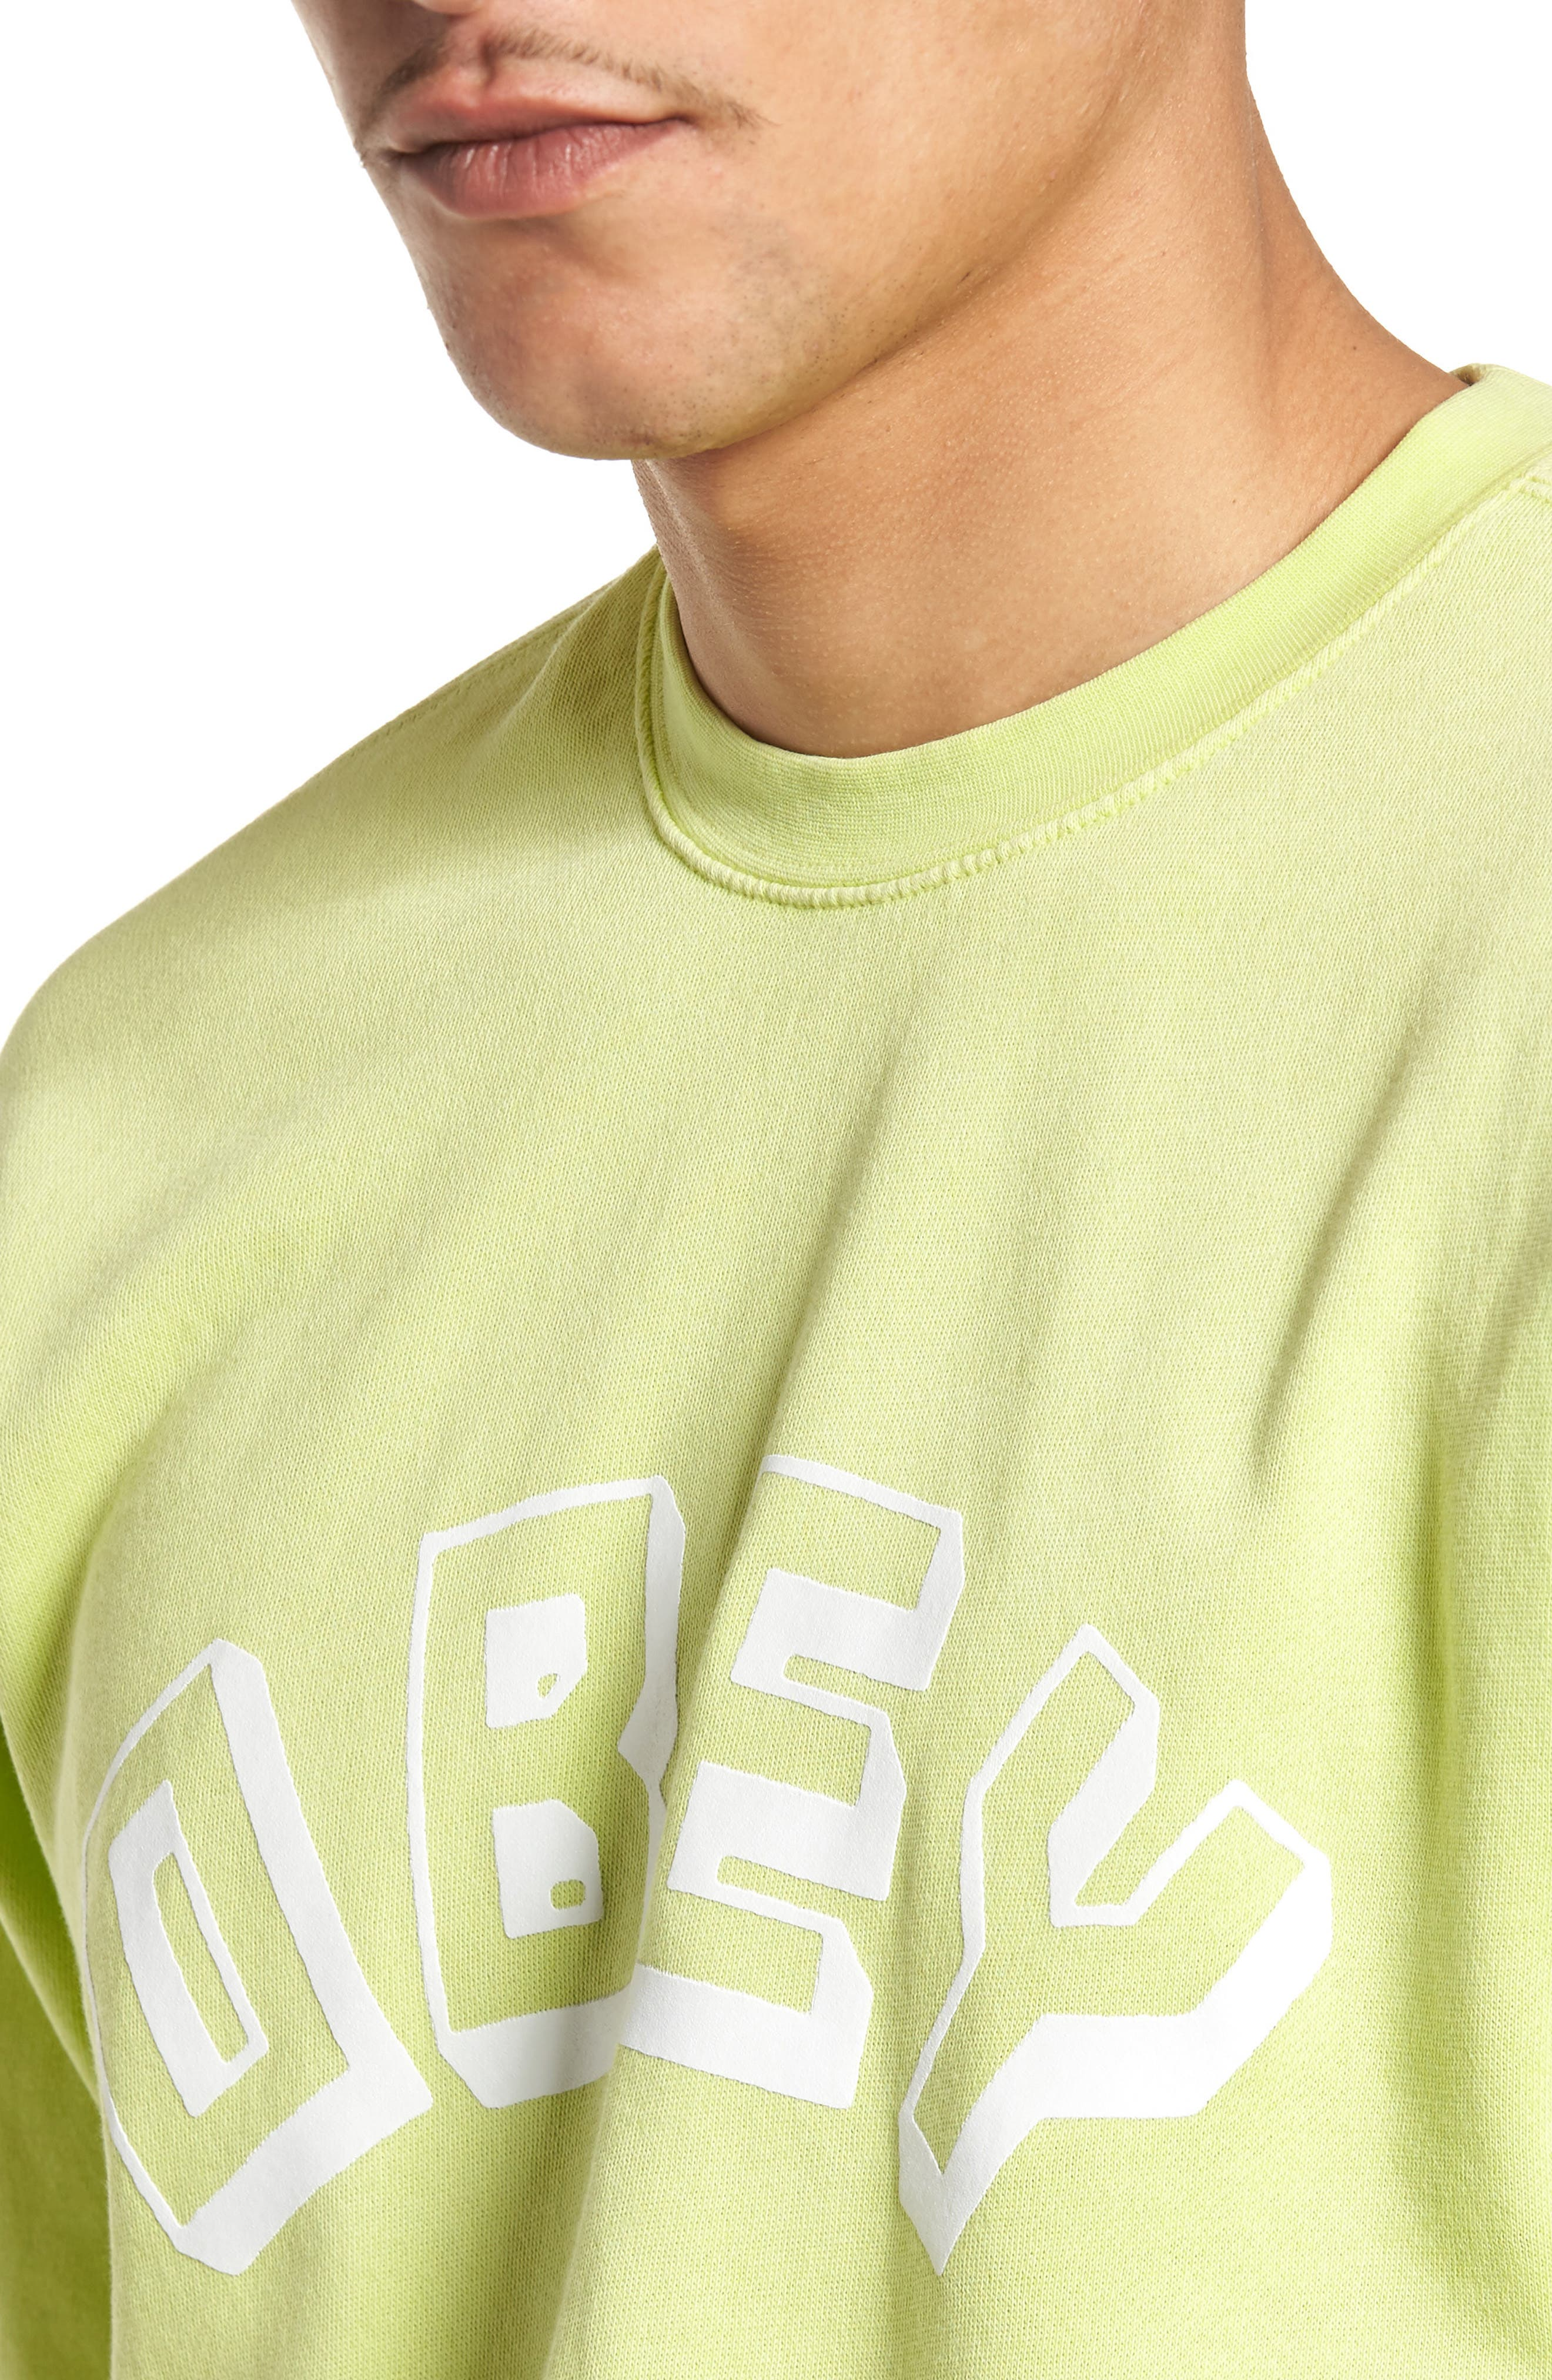 New World Sweatshirt,                             Alternate thumbnail 4, color,                             Dusty Mint